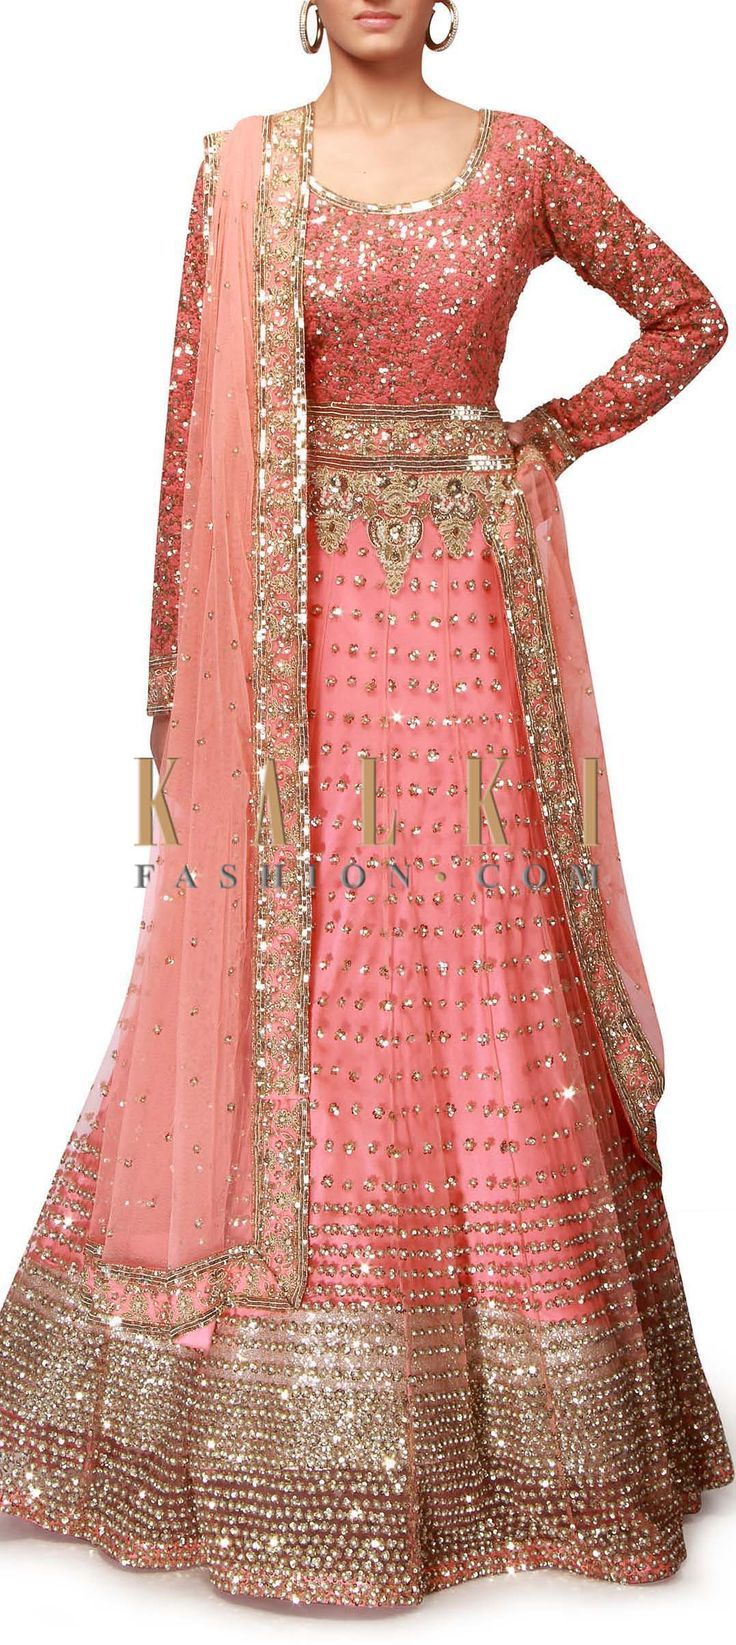 Dresses sarees suits lengha anarkali lehenga pink anarkali lehenga - Pink Anarkali Suit Adorn In Sequin Embroidery Only On Kalki Indian Suitsindian Dressesindian Clothesindian Wearindian Styleanarkali Lehengaindian